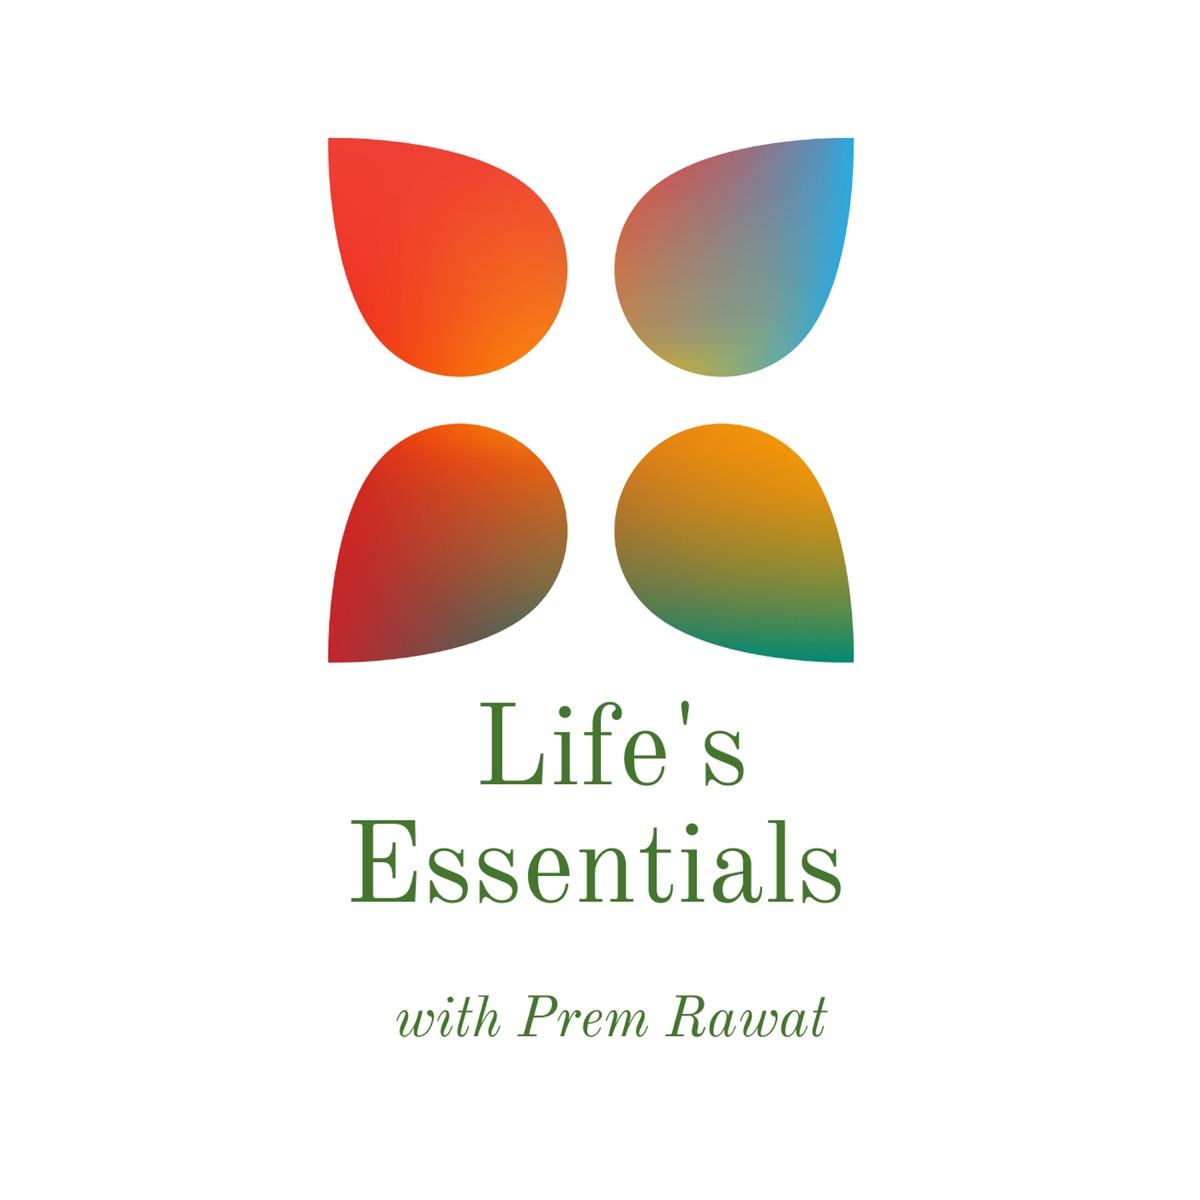 Life's Essentials with Prem Rawat